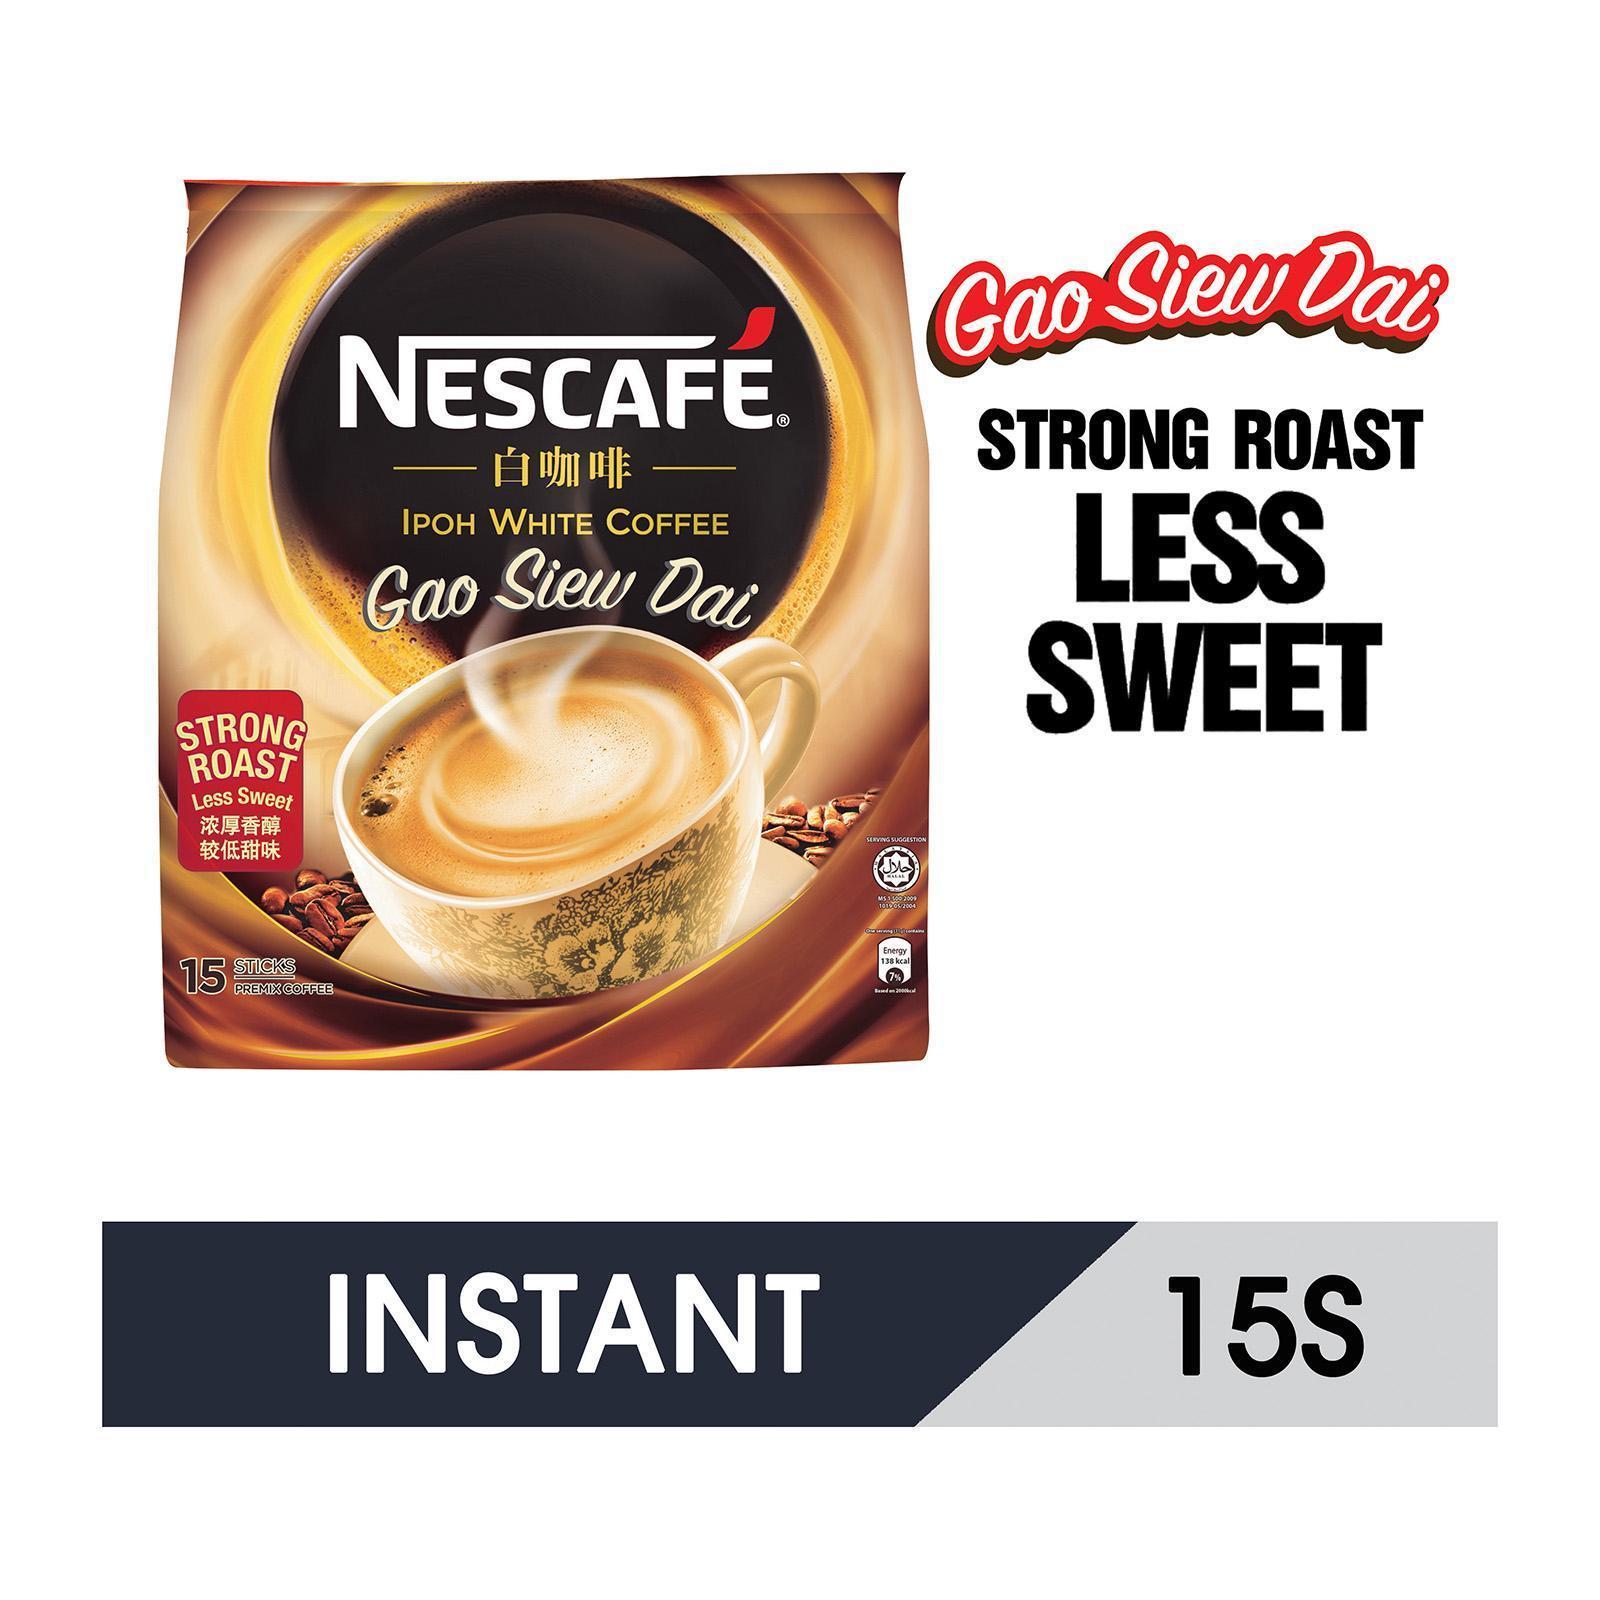 NESCAFE Ipoh White Coffee Gao Siew Dai (Less Sweet) 15sX36g